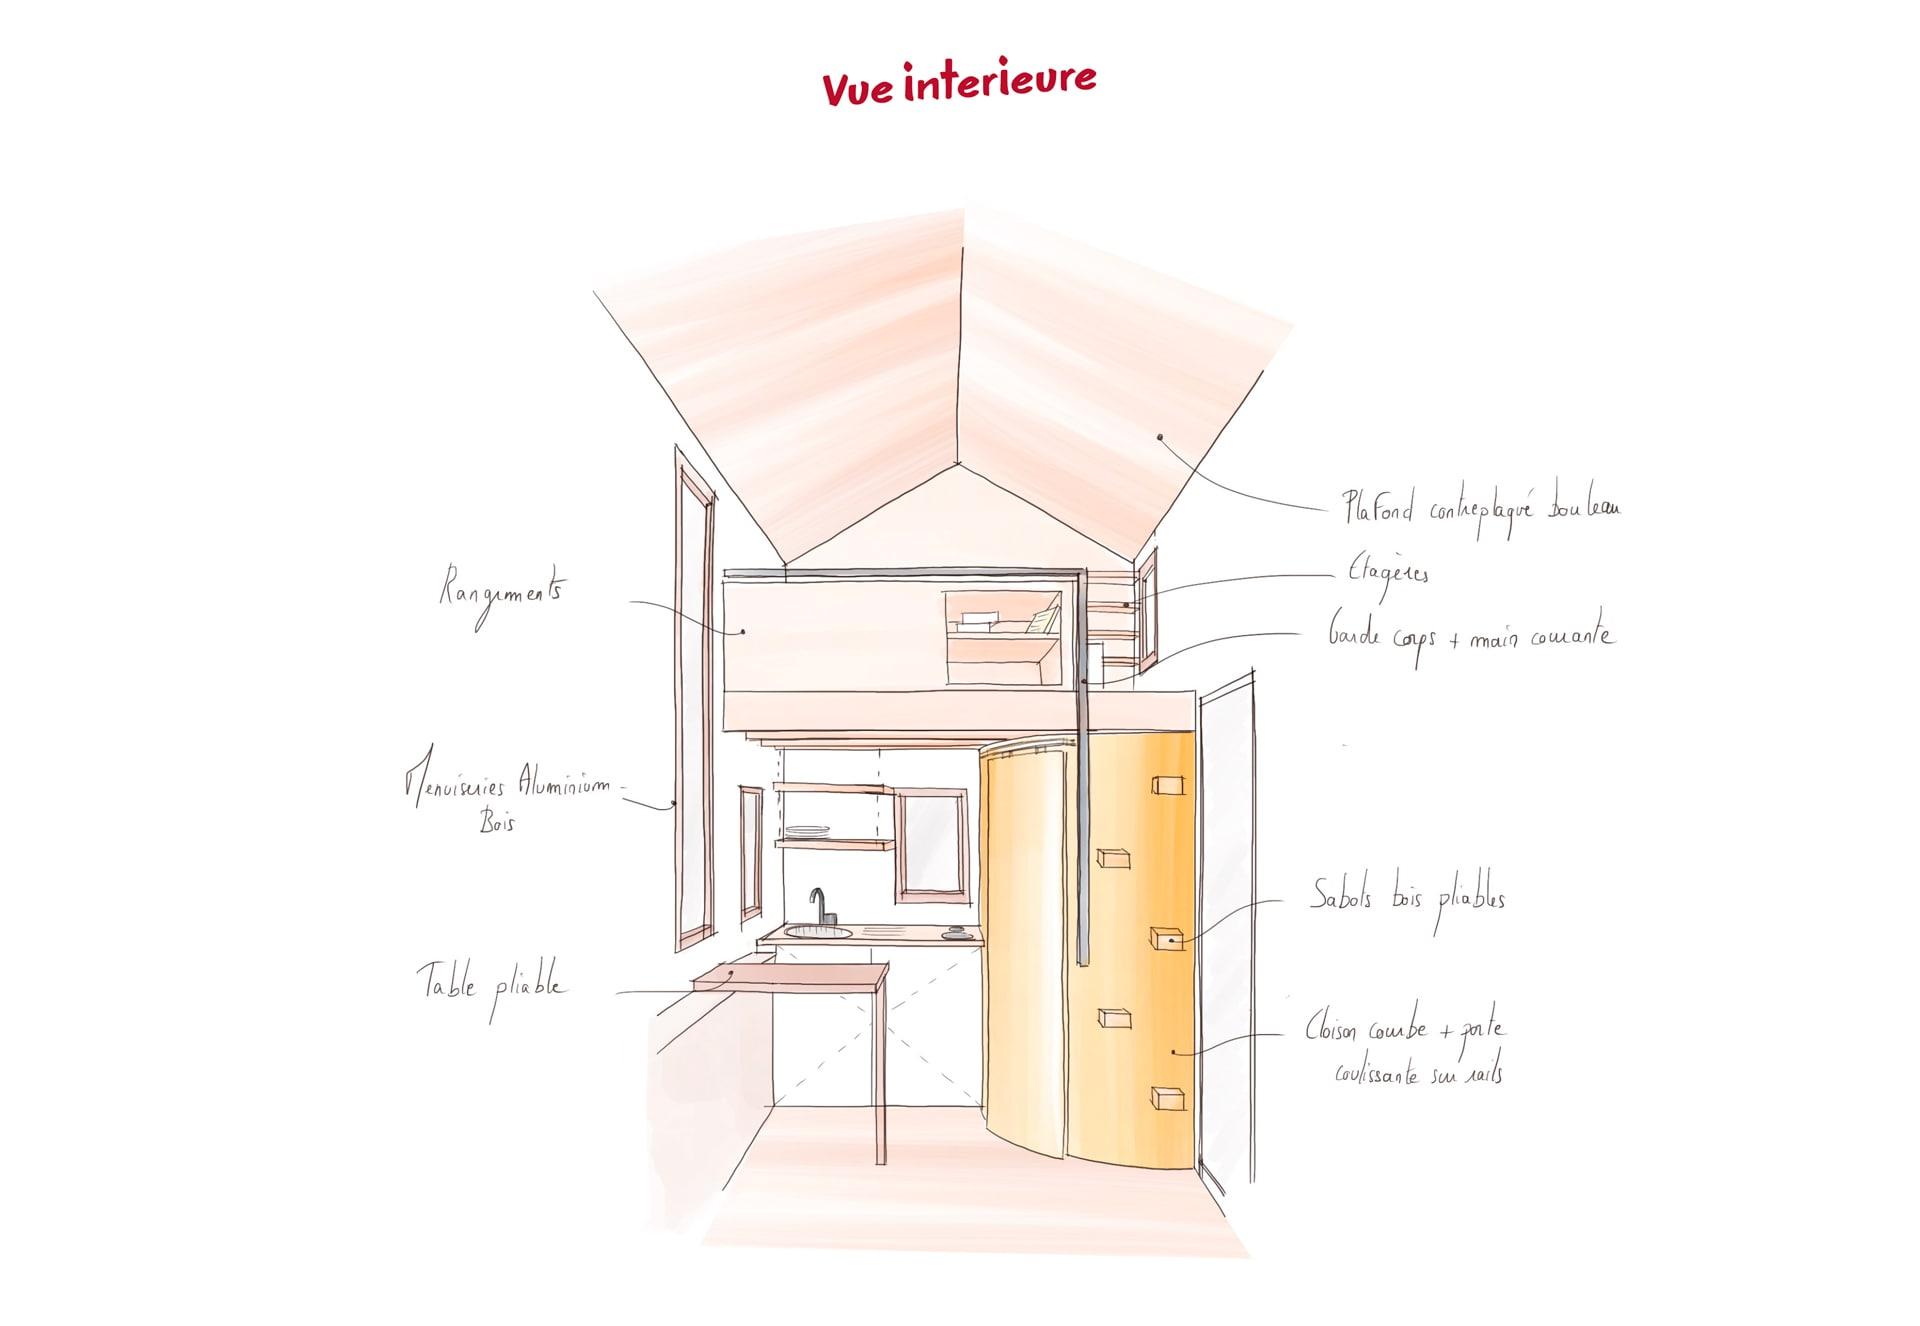 tiny-house-particulier-mini-vue-interieure